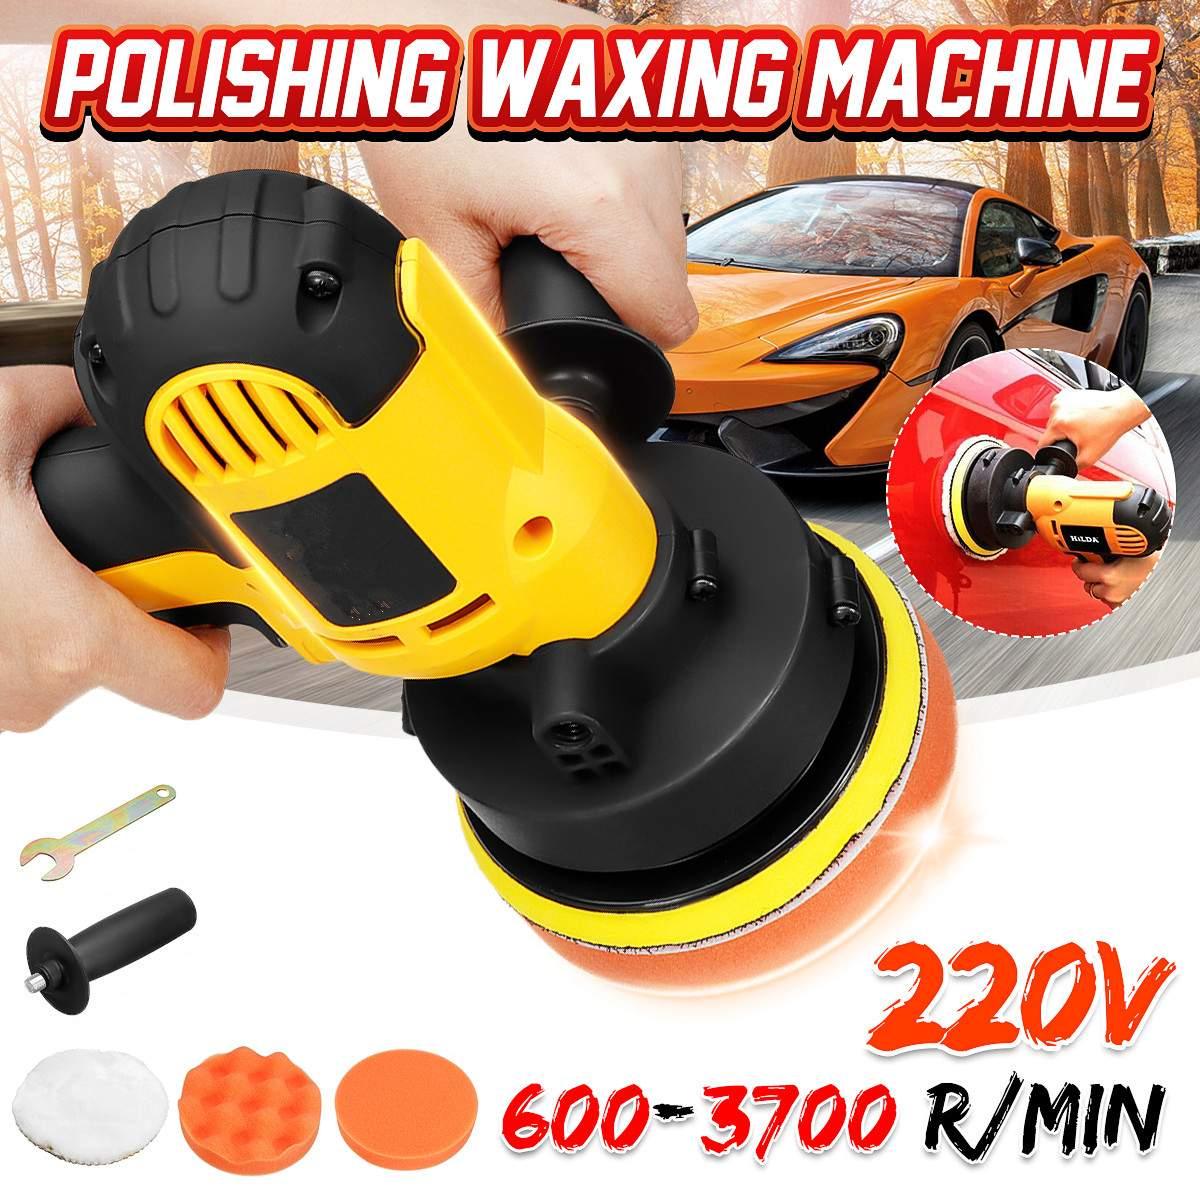 High-precision Low-noise Car Waxing Tool 220V 700W Polishing And Polishing Machine Car Scratch Repair Sealing Glazing Machine